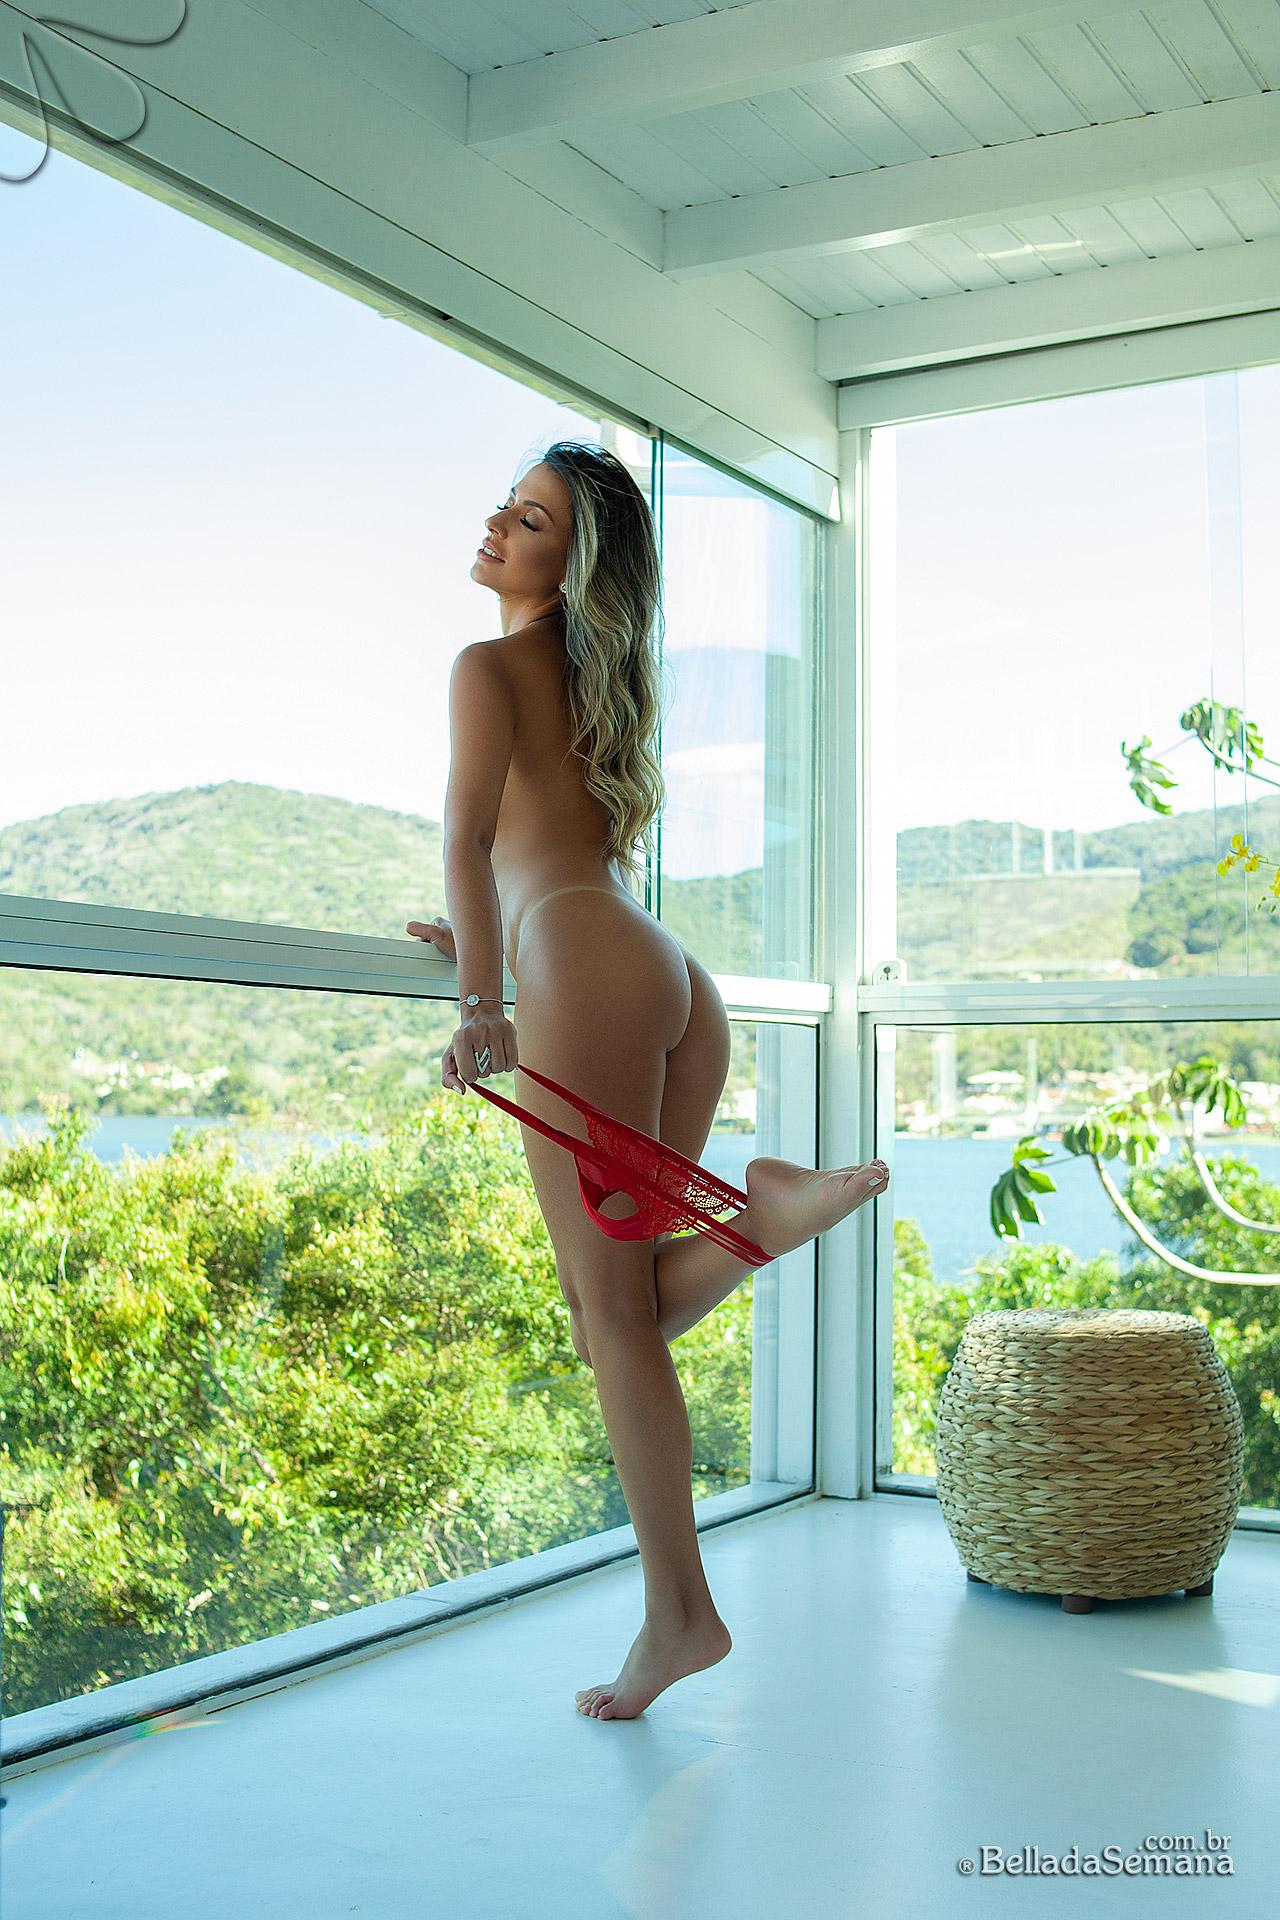 Luana Lodi outra vez | Bella da Semana